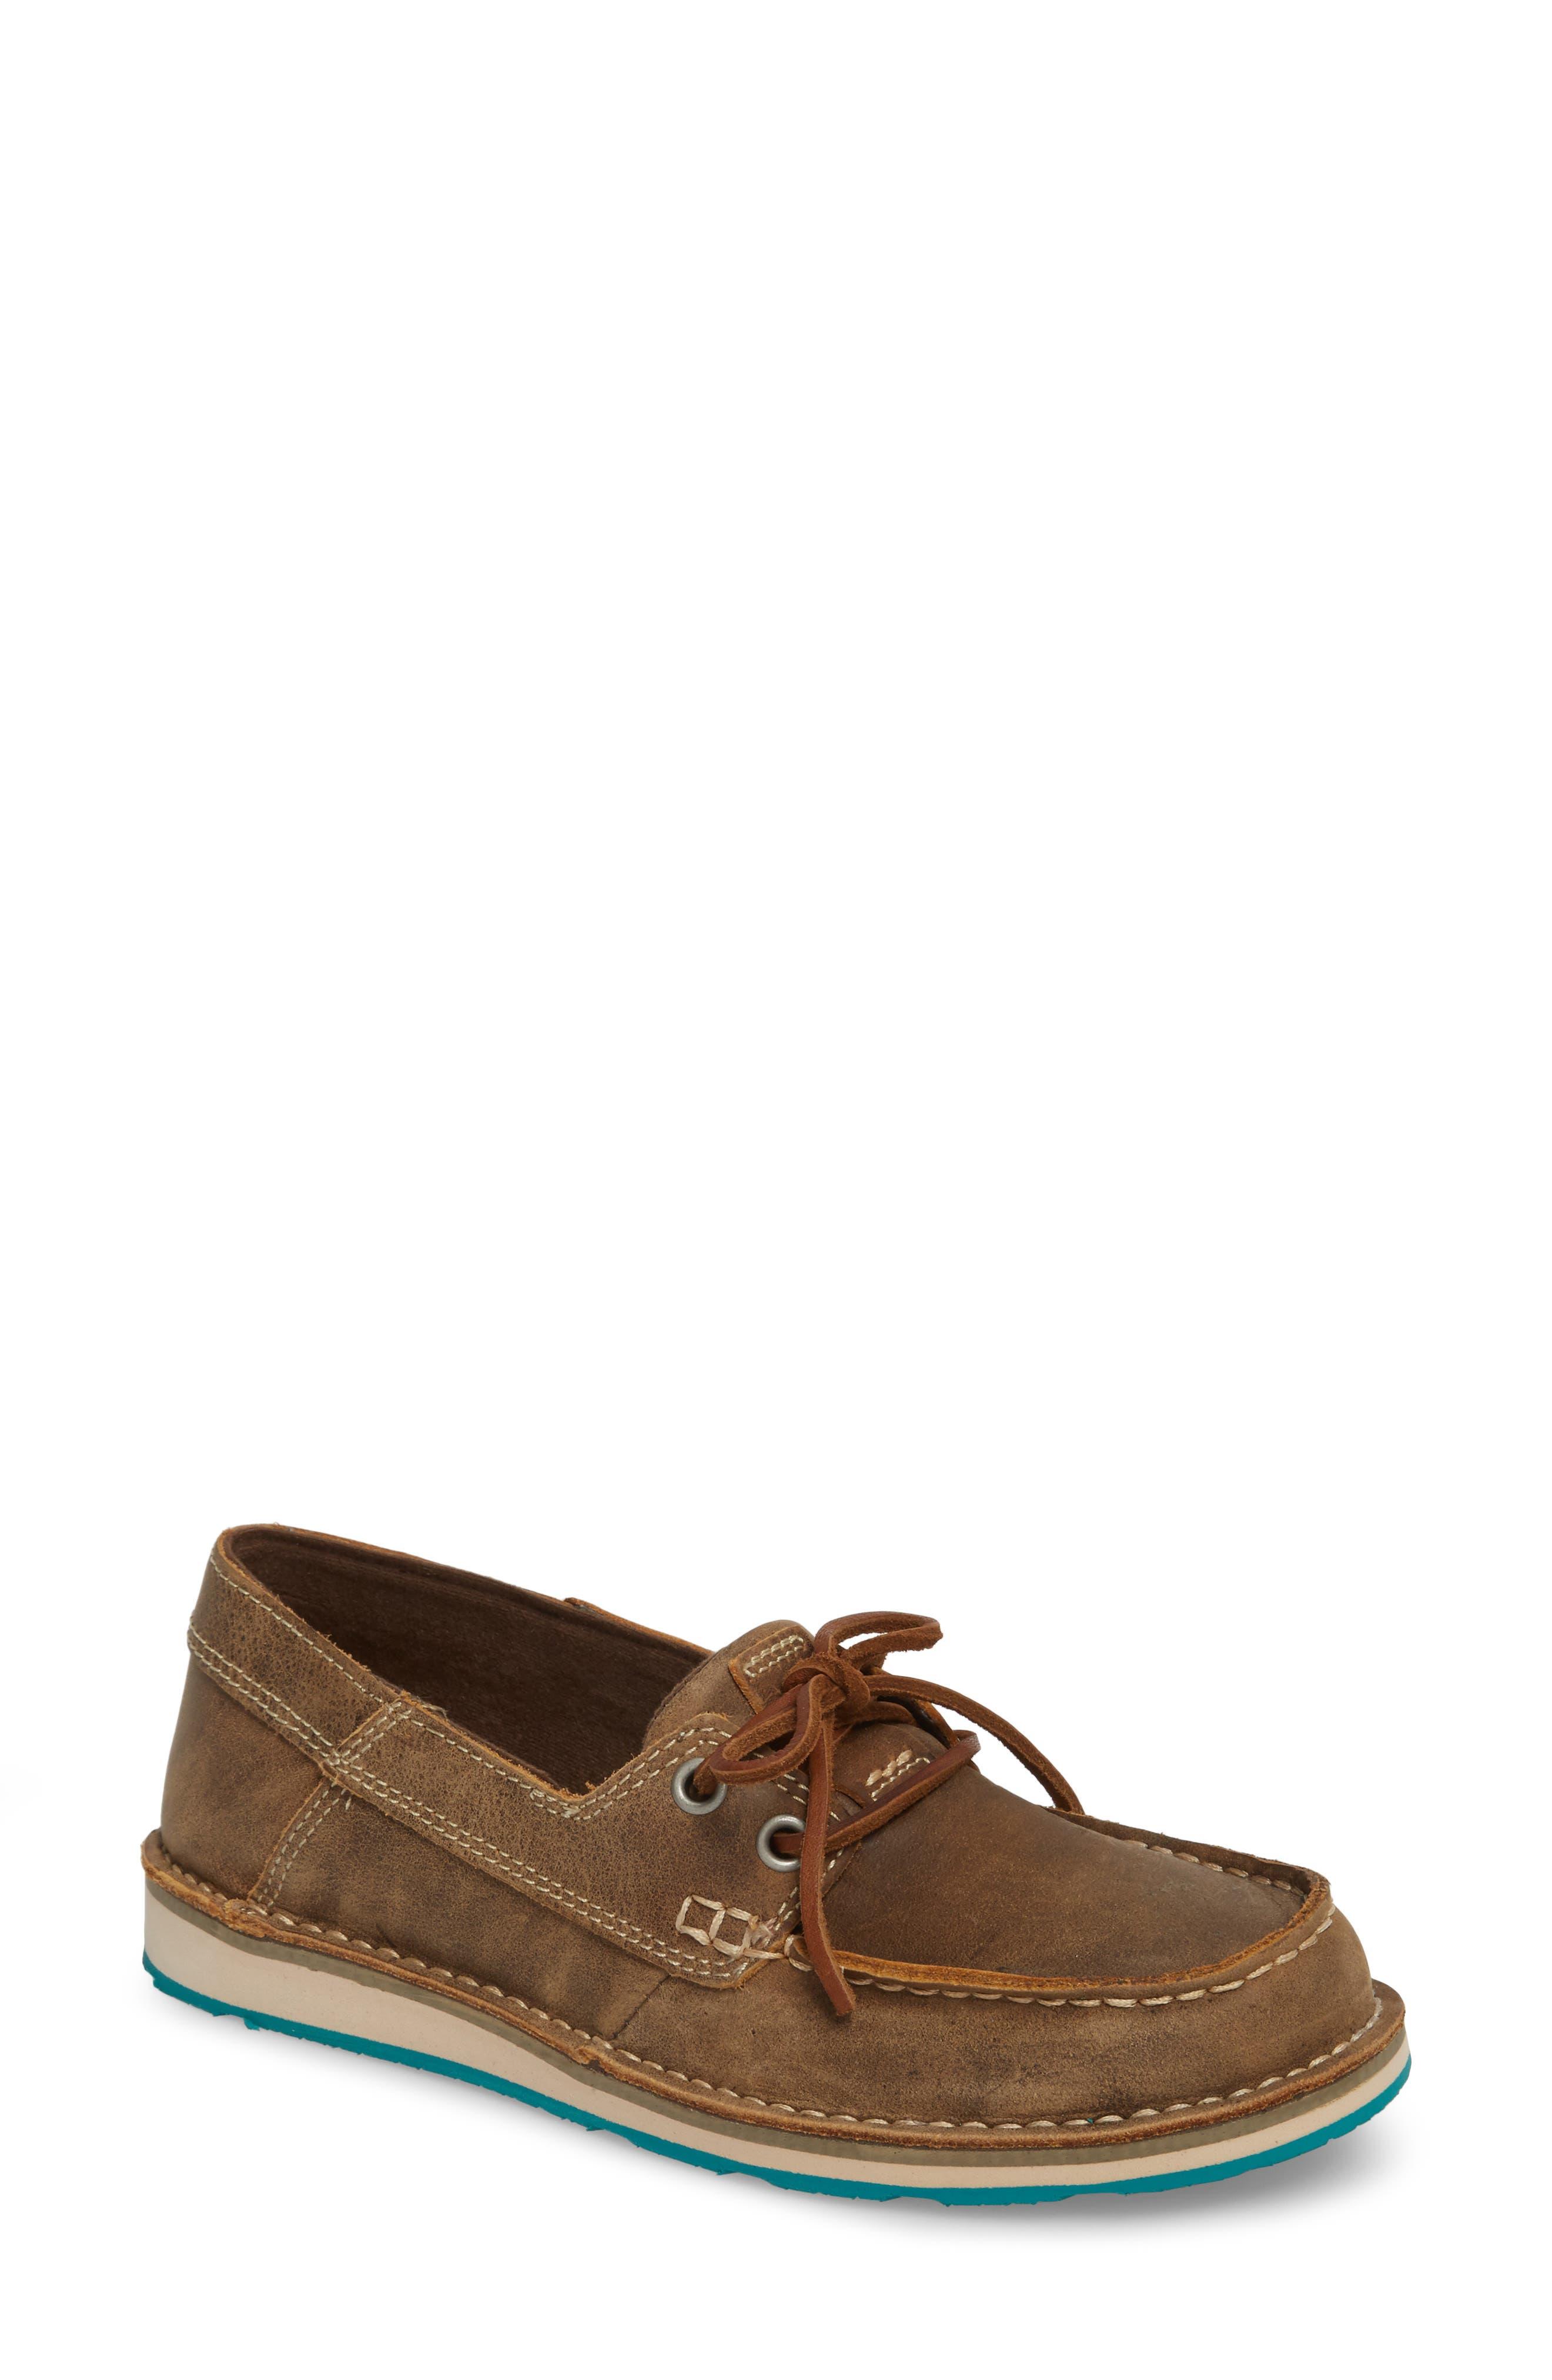 Cruiser Castaway Loafer, Brown Bomber Leather